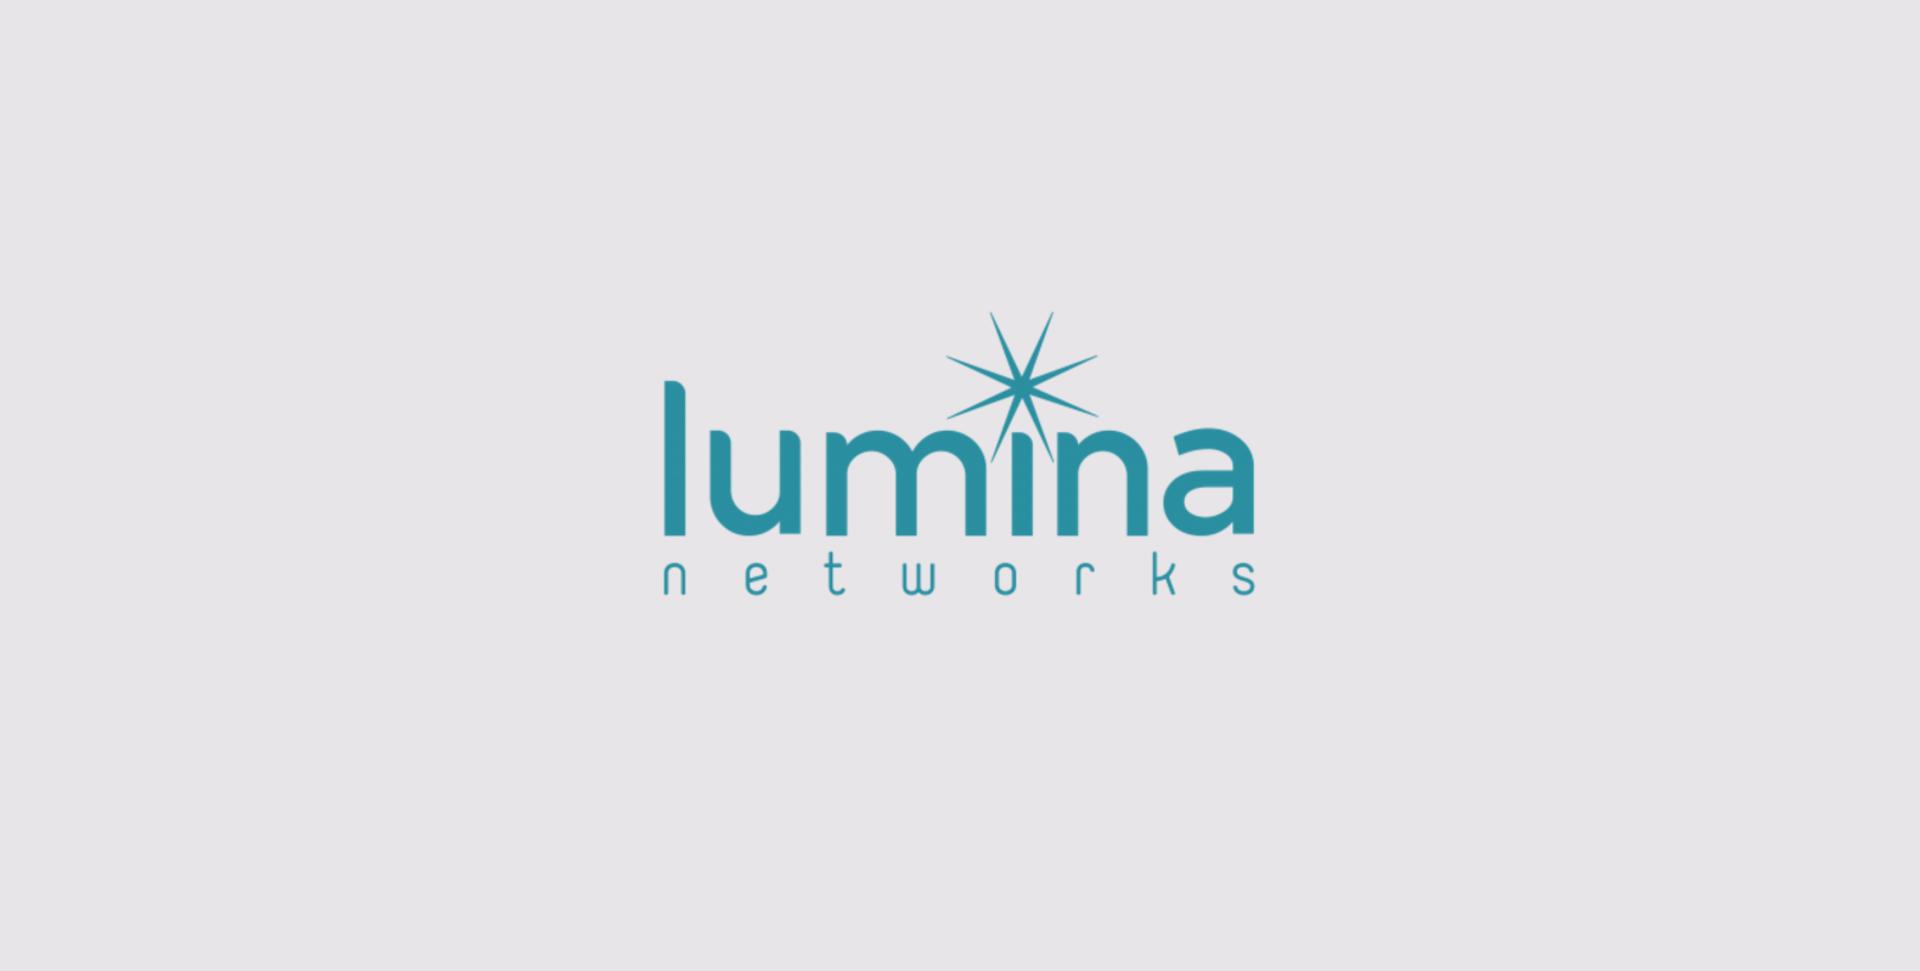 Cloudify partners with Lumina